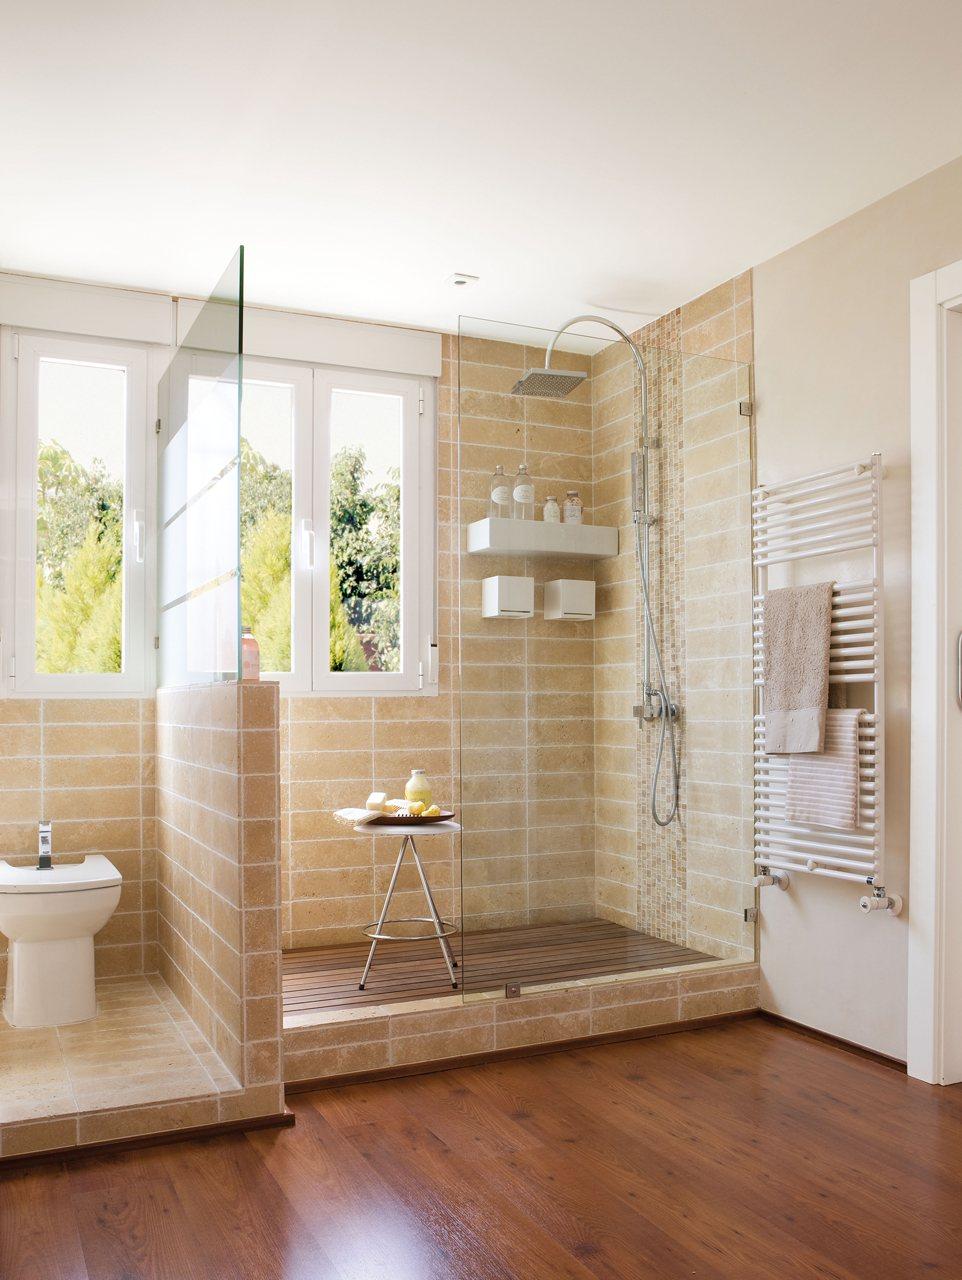 Ba os con ducha grande for Imagenes de banos pequenos con ducha